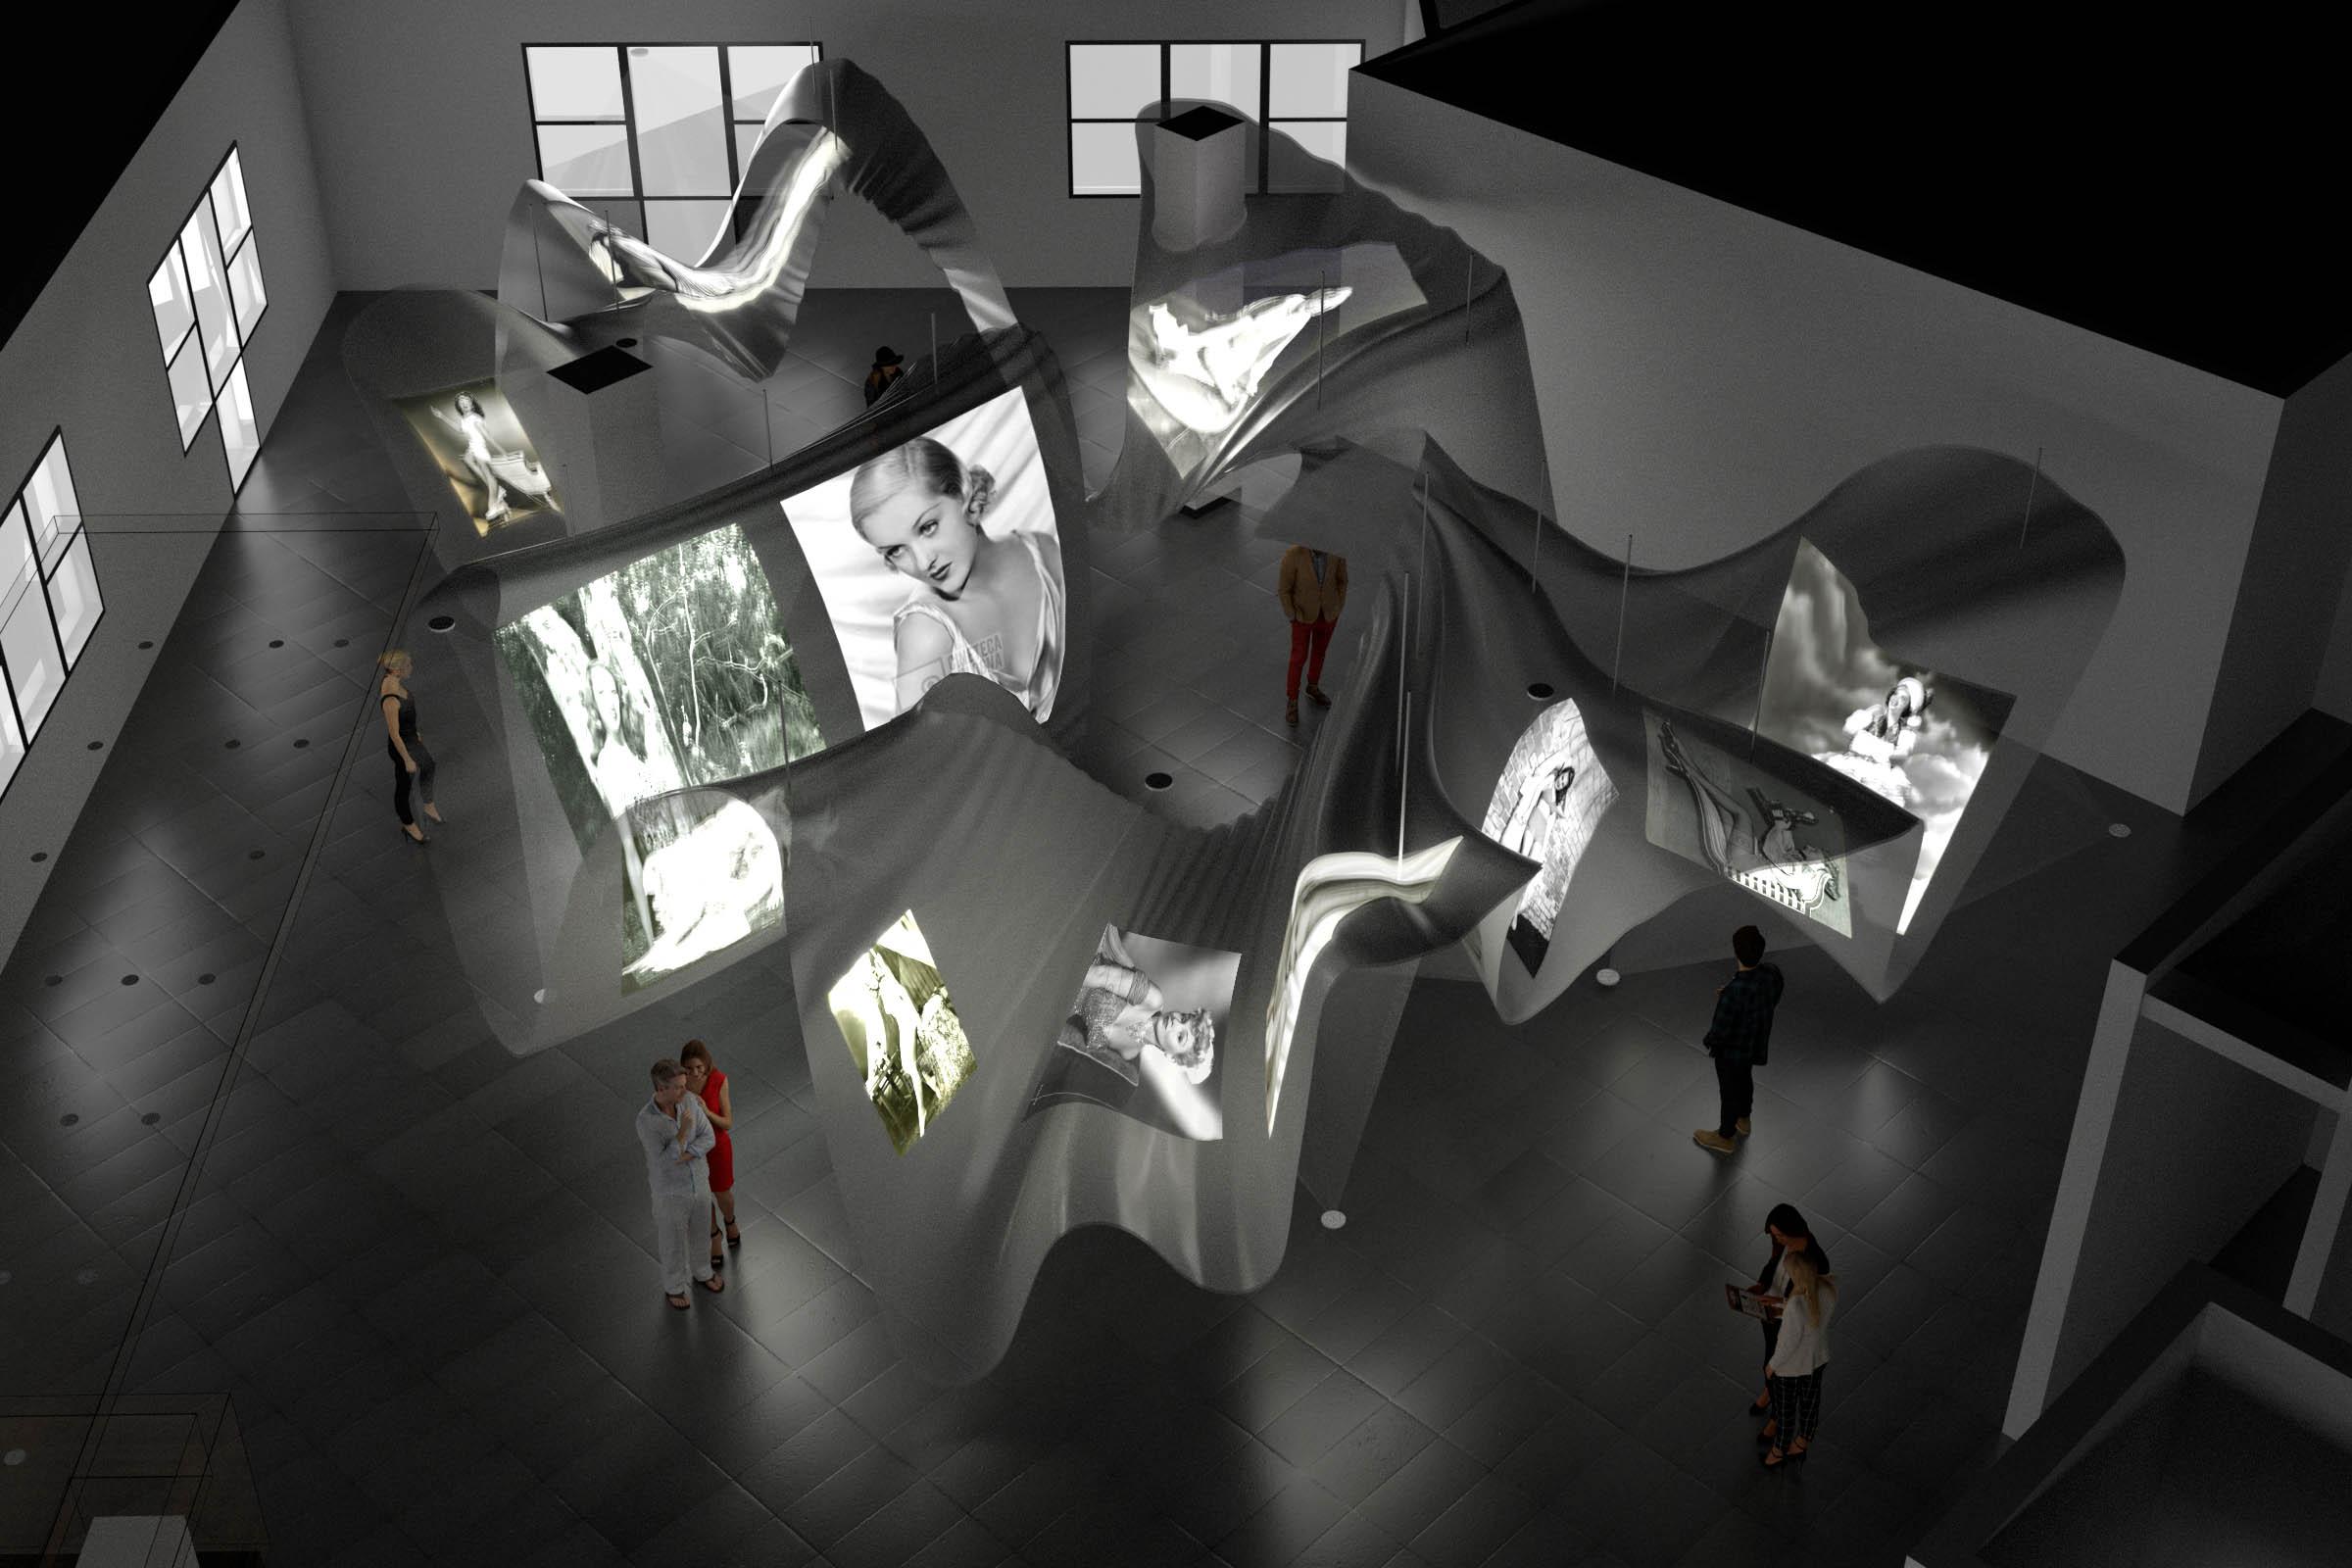 SPANS associates - The Seduction Pavilion - Unfammous stars - Marylin Monroe - 3D printing - Render 31.jpg